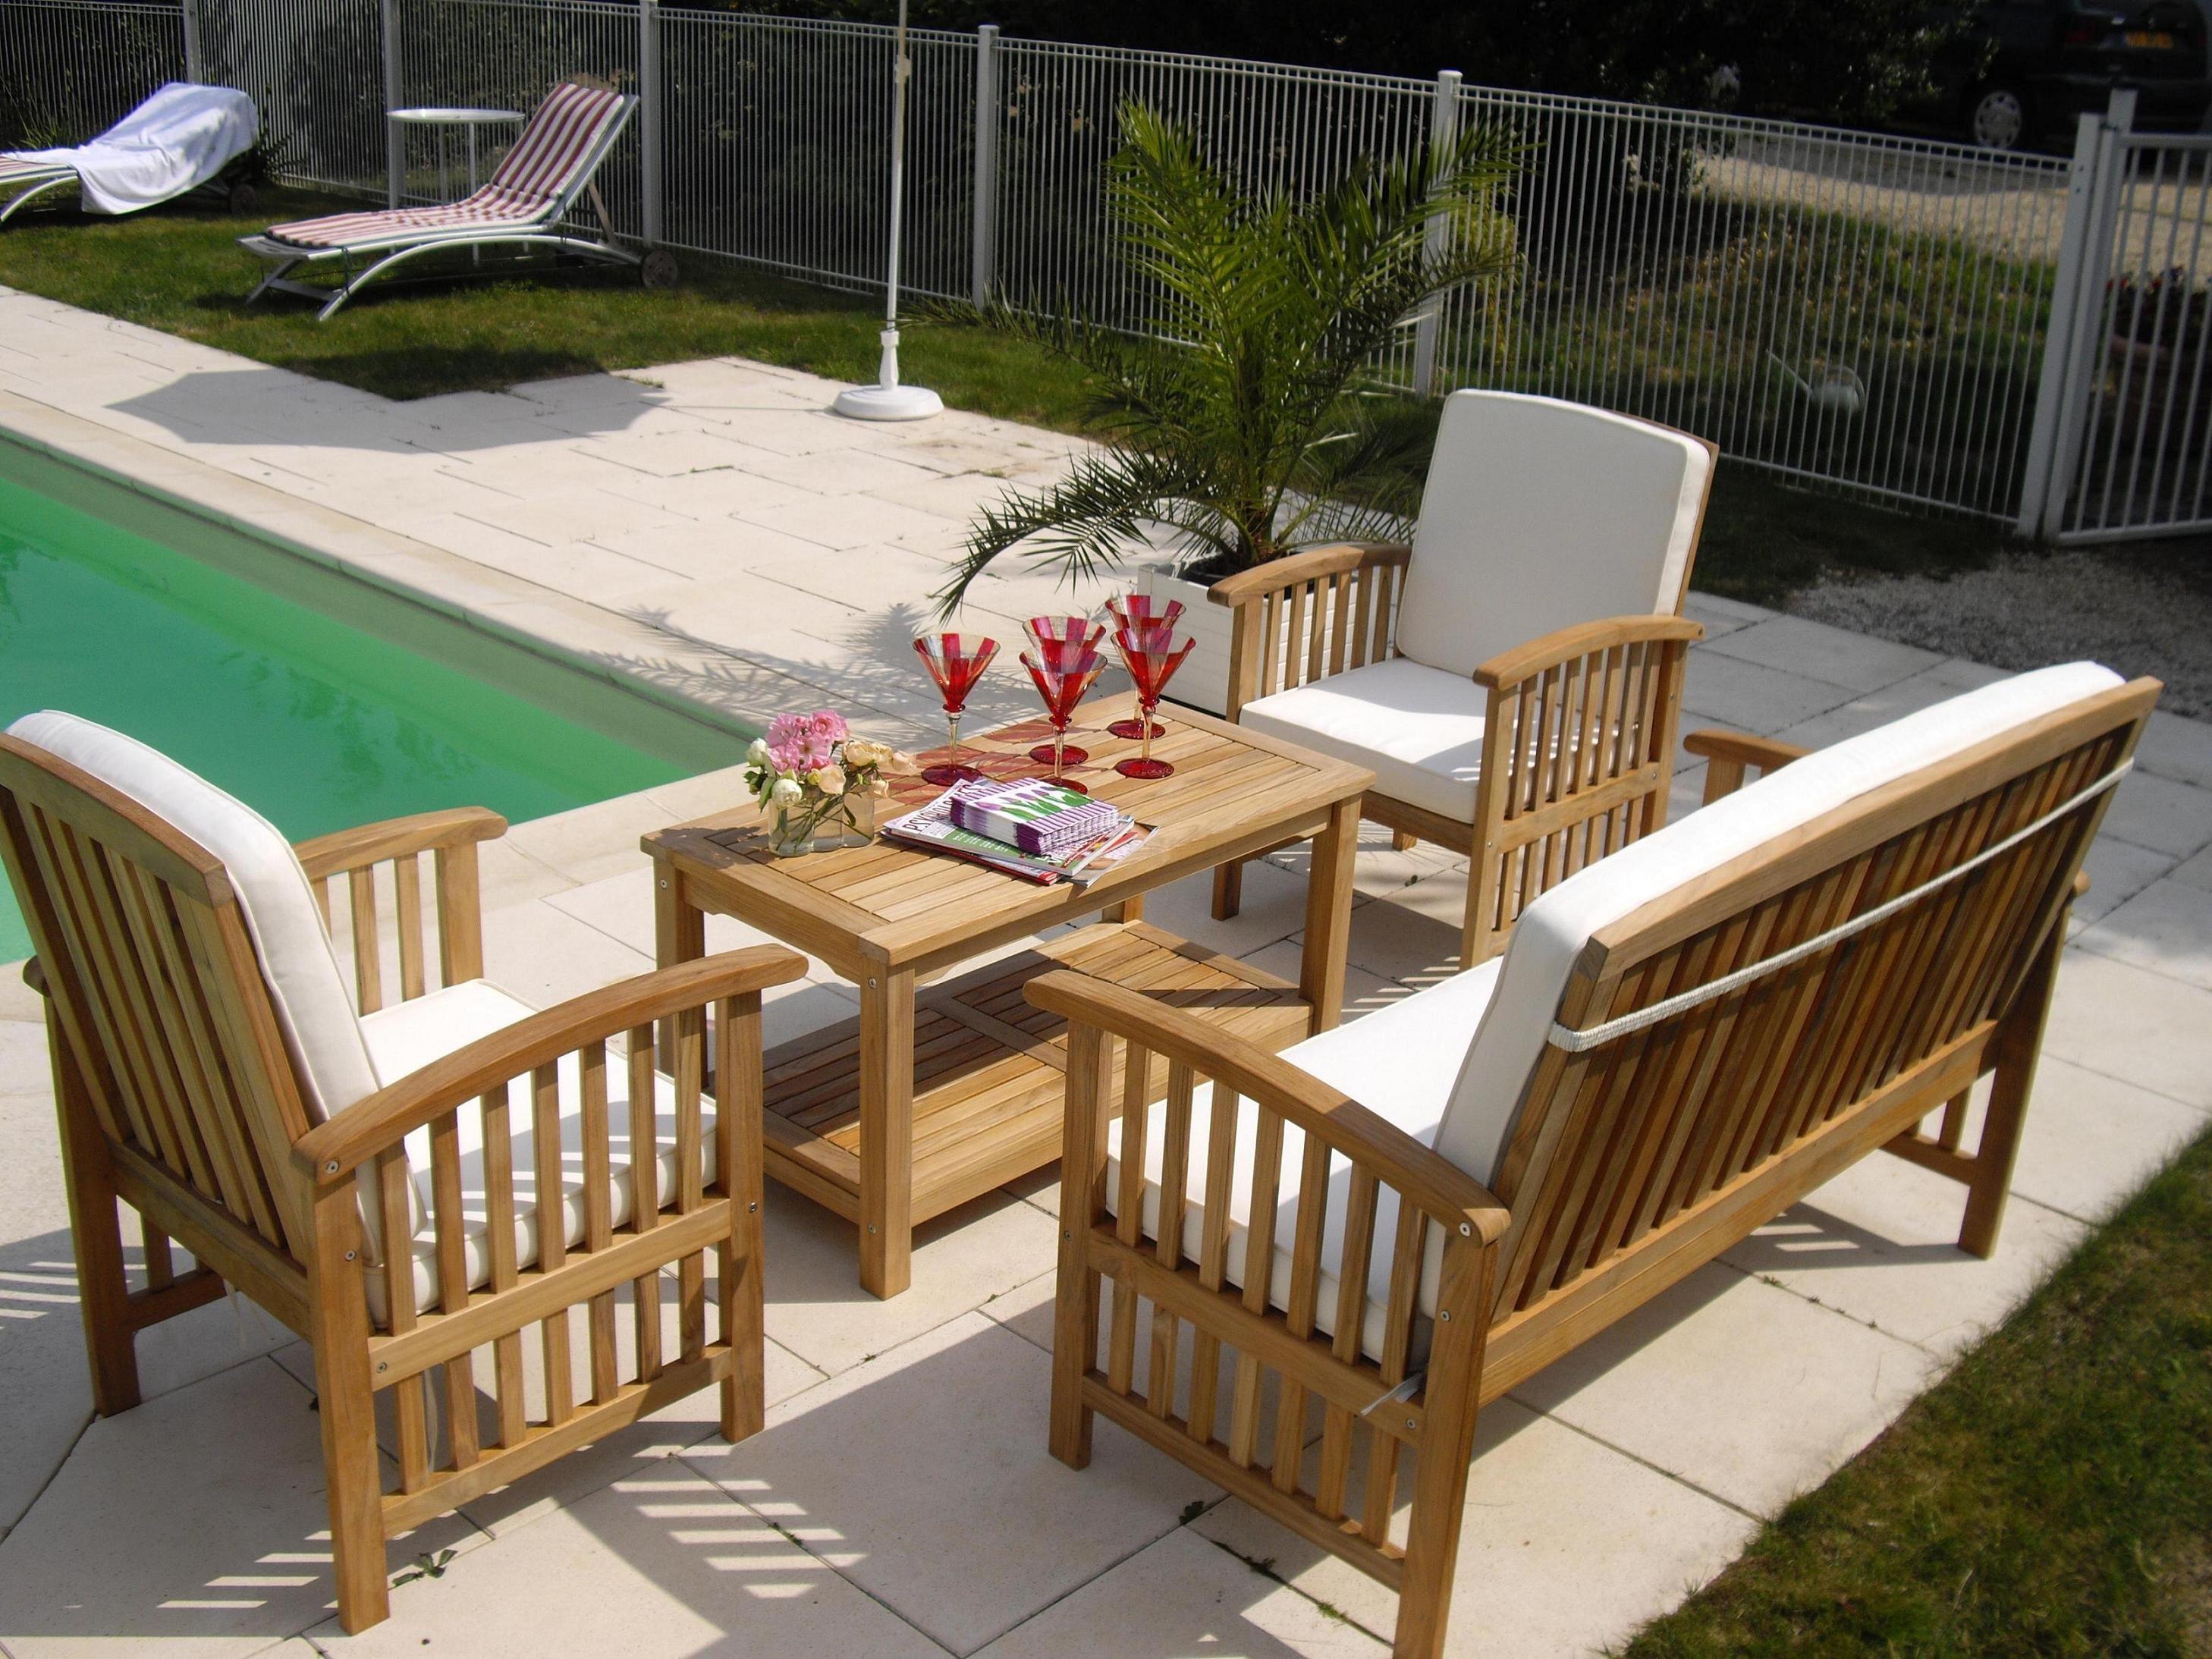 Salon de jardin en bois solde - Mailleraye.fr jardin